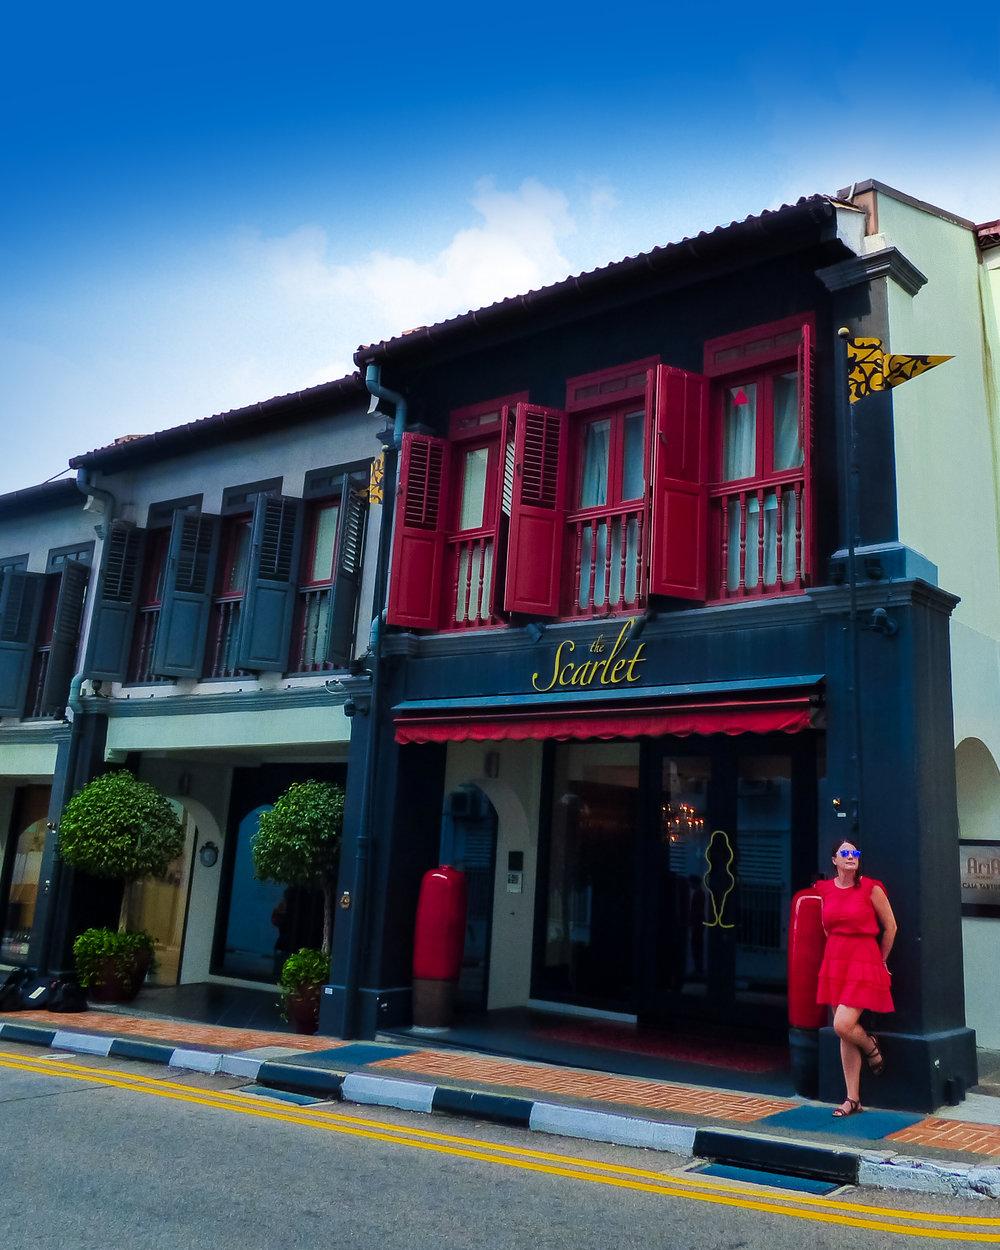 singapore_scarlet.jpg